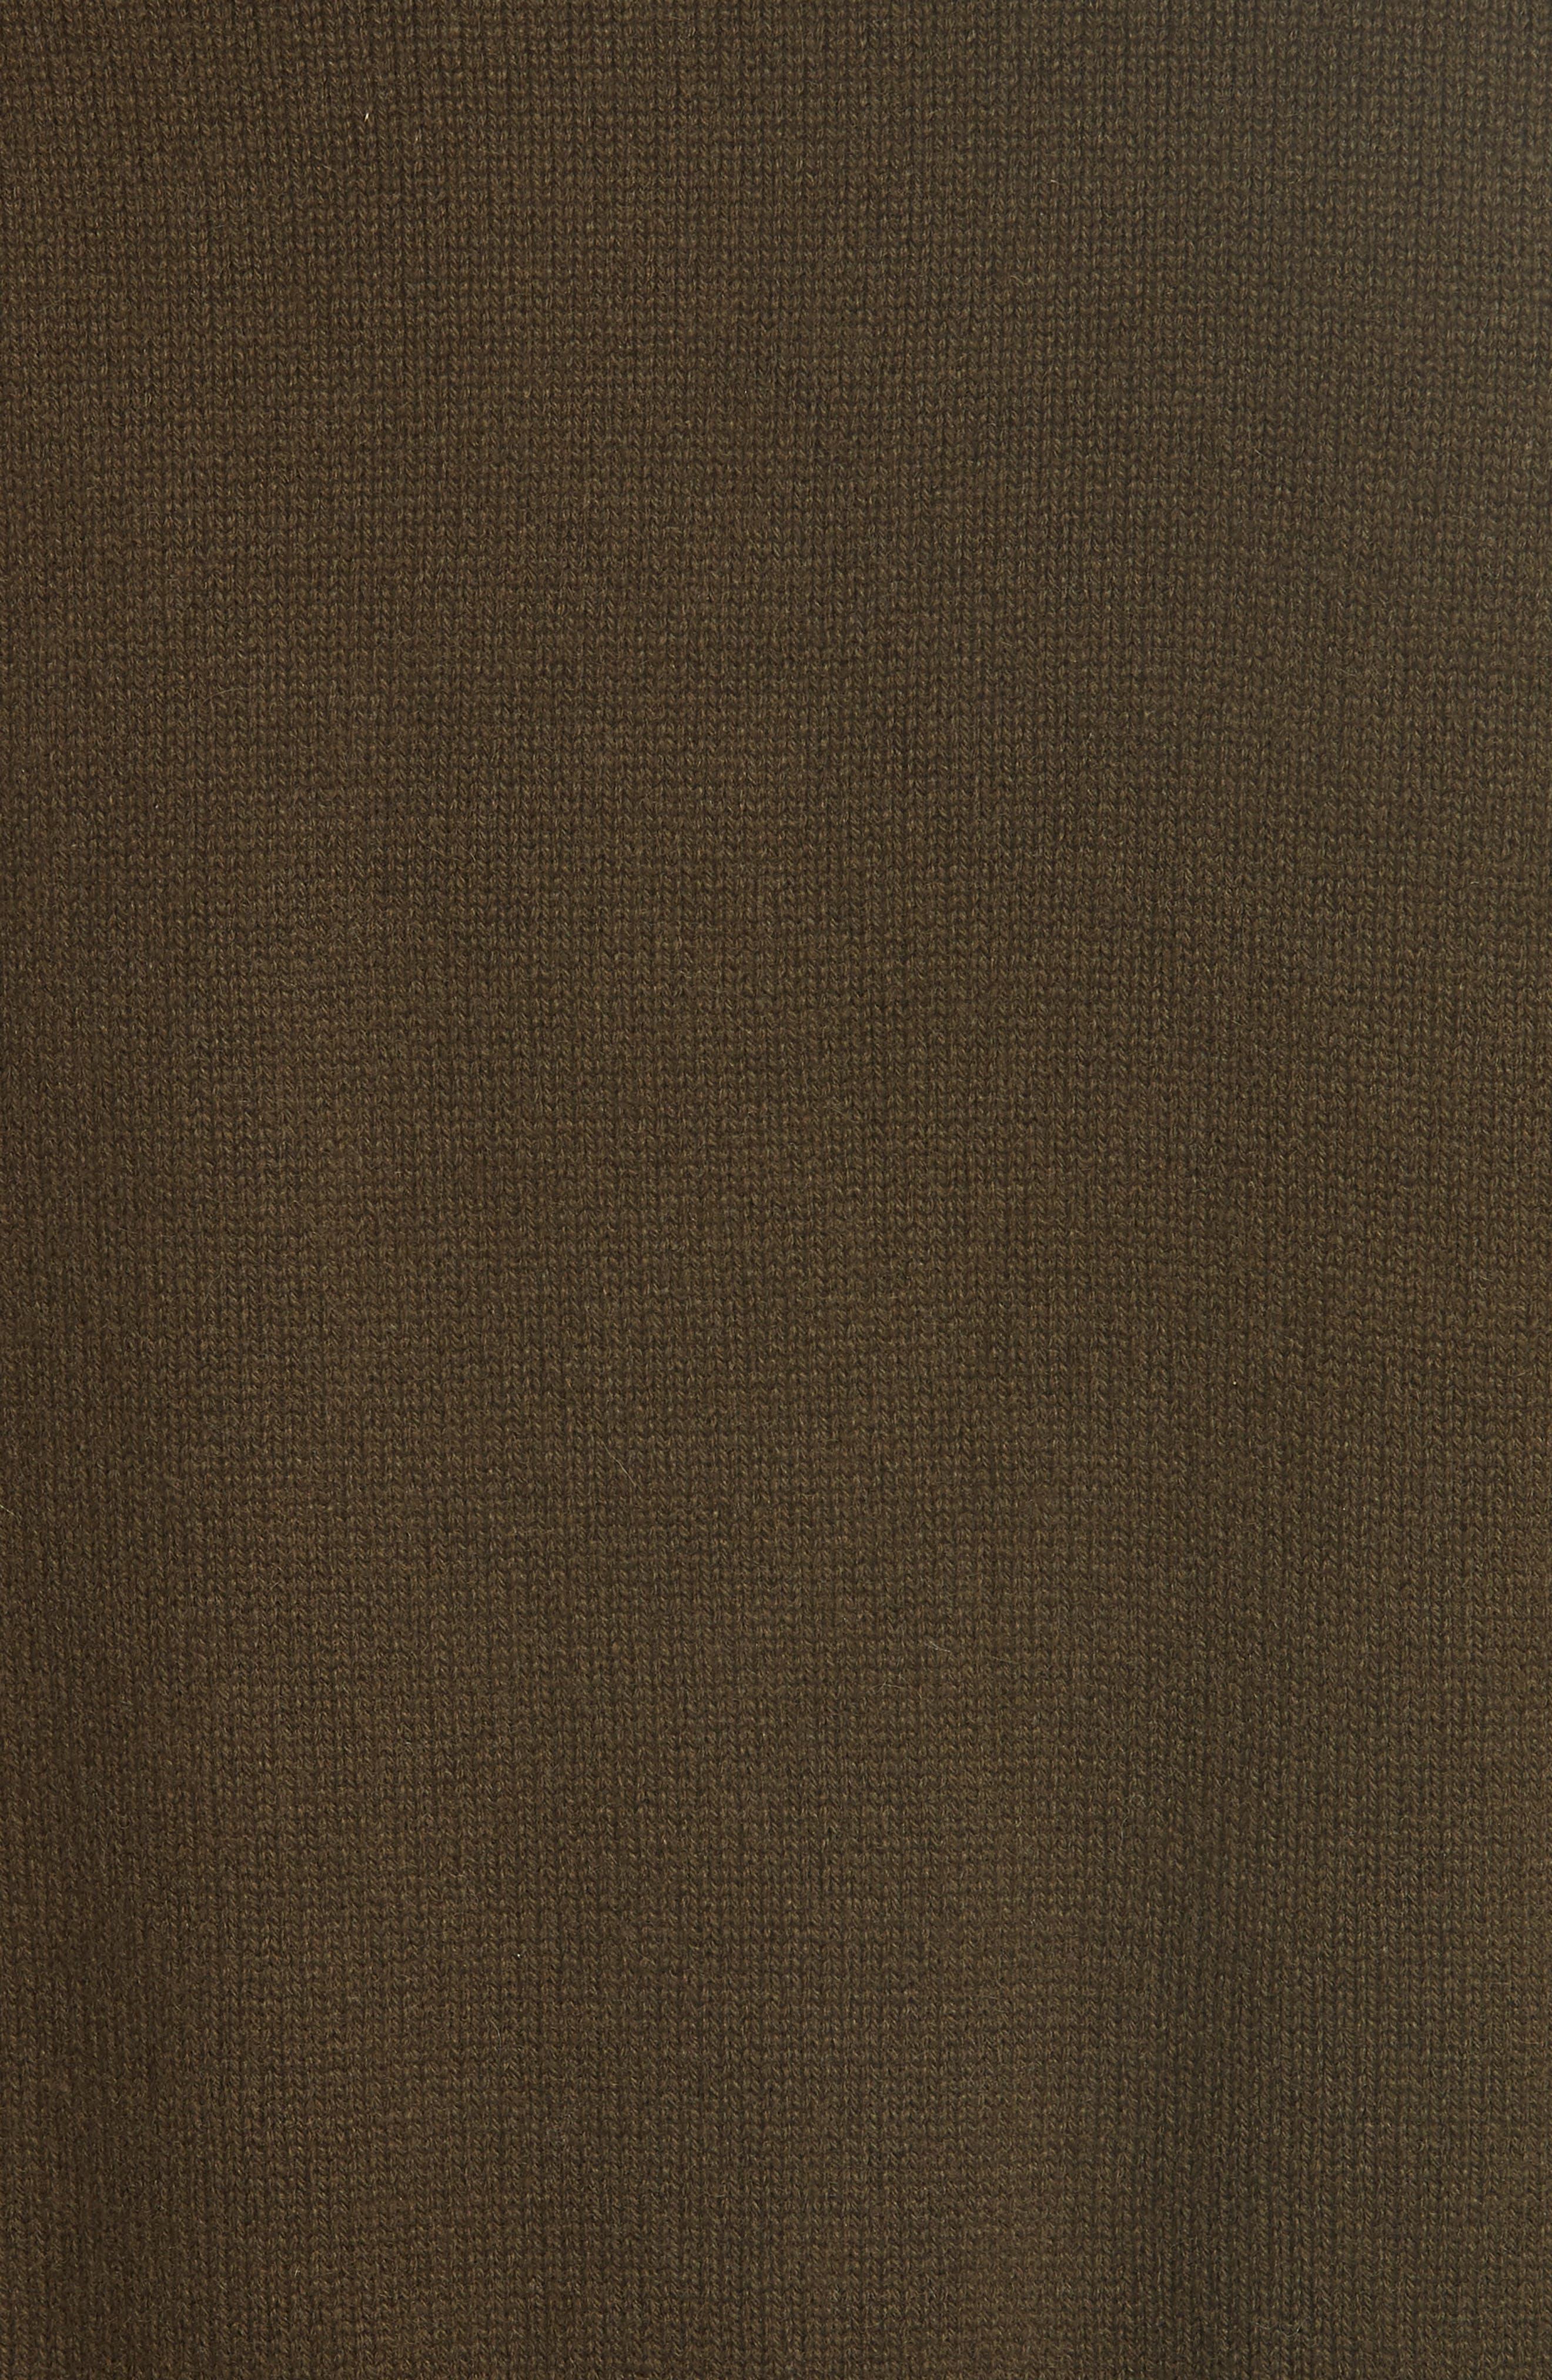 Cashmere Wrap Cardigan,                             Alternate thumbnail 5, color,                             Peat